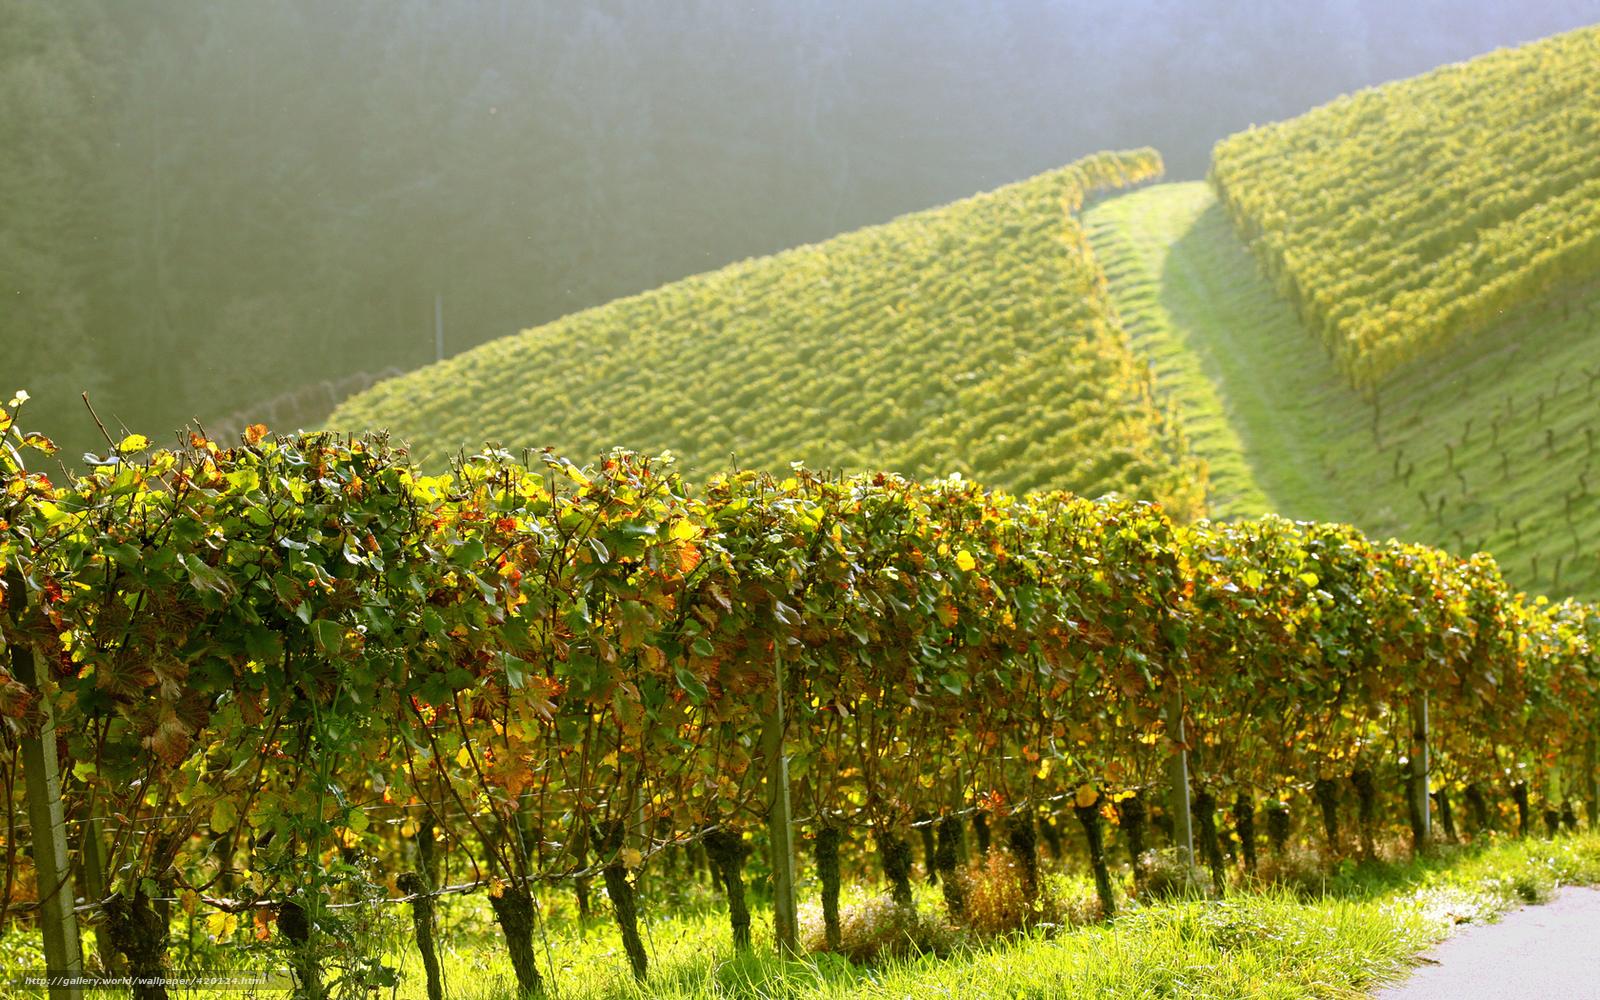 Download wallpaper Vineyards,  Hills,  Morning free desktop wallpaper in the resolution 1680x1050 — picture №420124